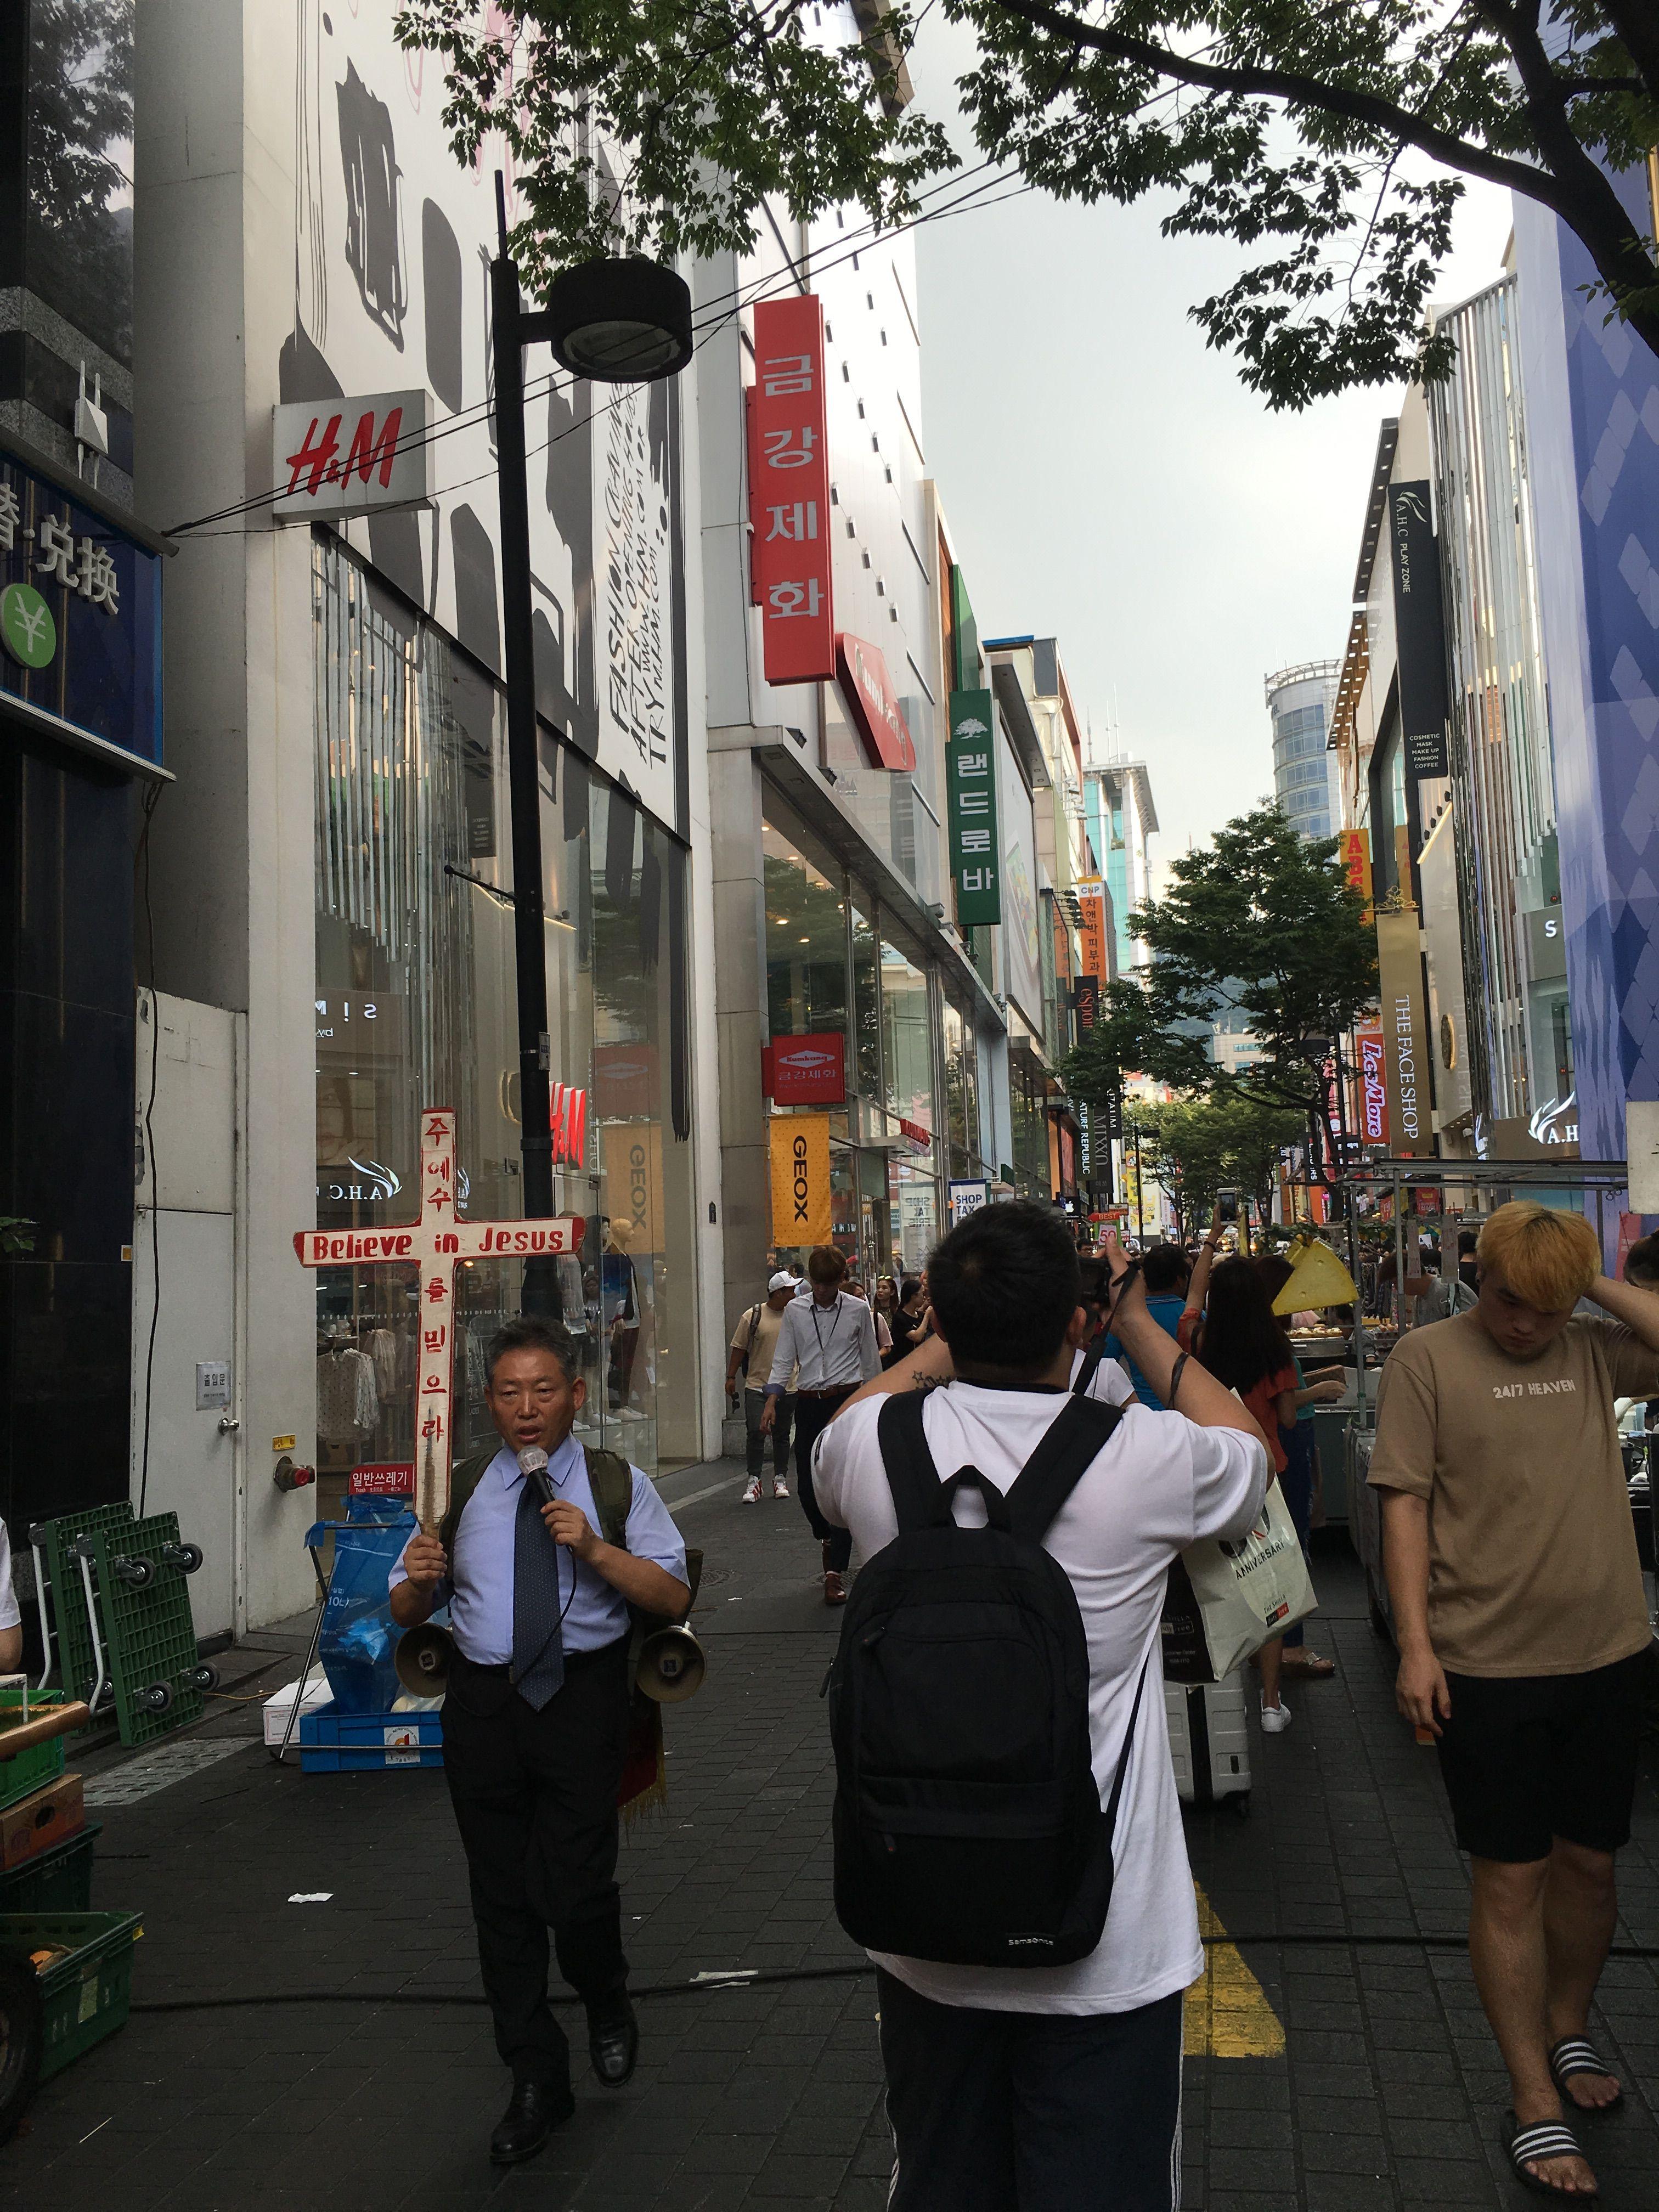 Einkaufsstrasse In Myeongdong Shopping Street In Myeongdong Myeongdong Shopping Shopping Street Street